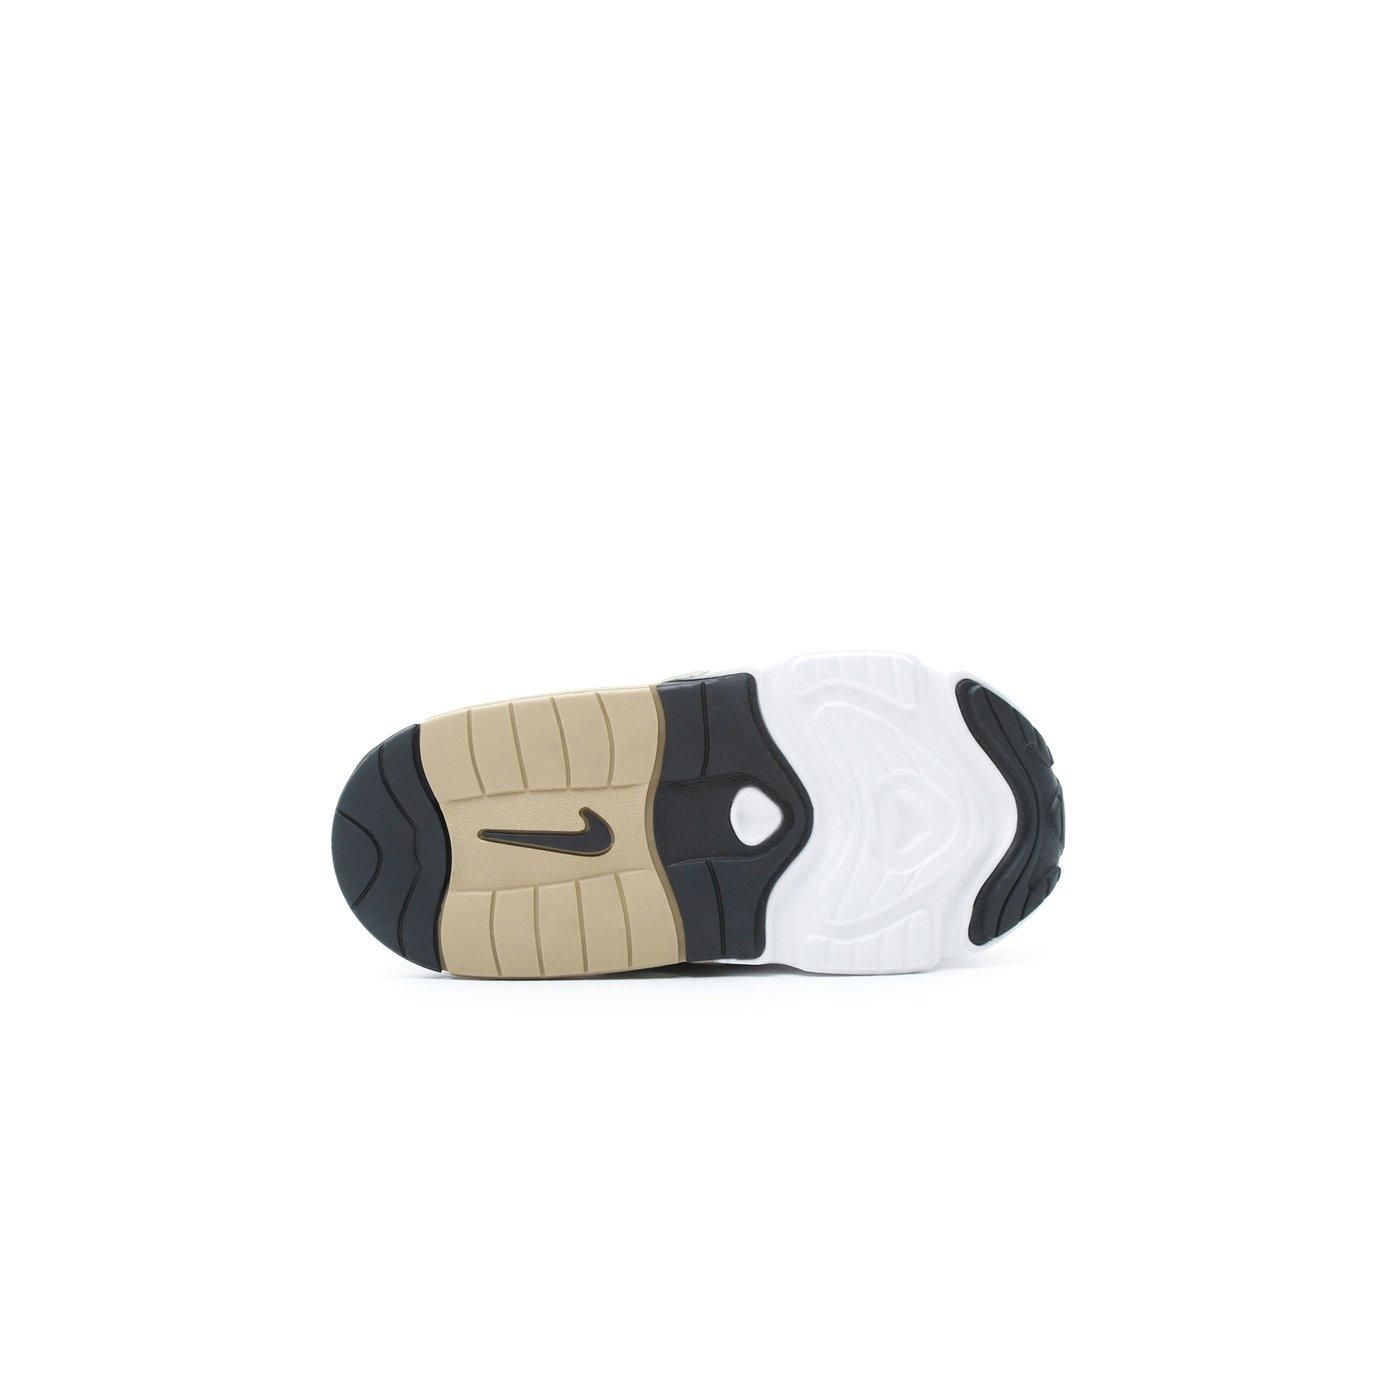 Nike Air Max 200 Siyah Bebek Spor Ayakkabı